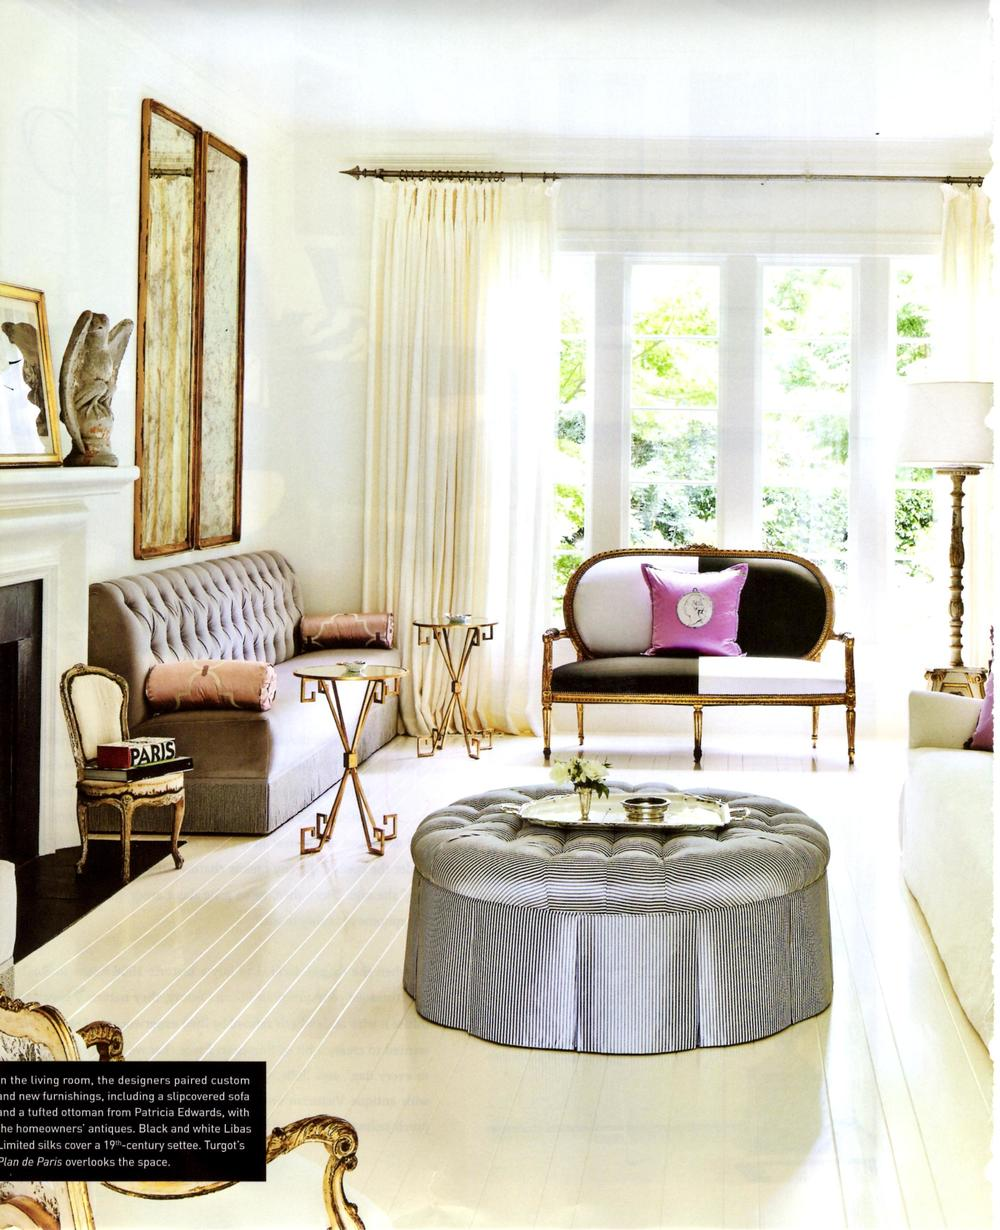 myrahoeferdesign_luxe_magazine_4.jpg